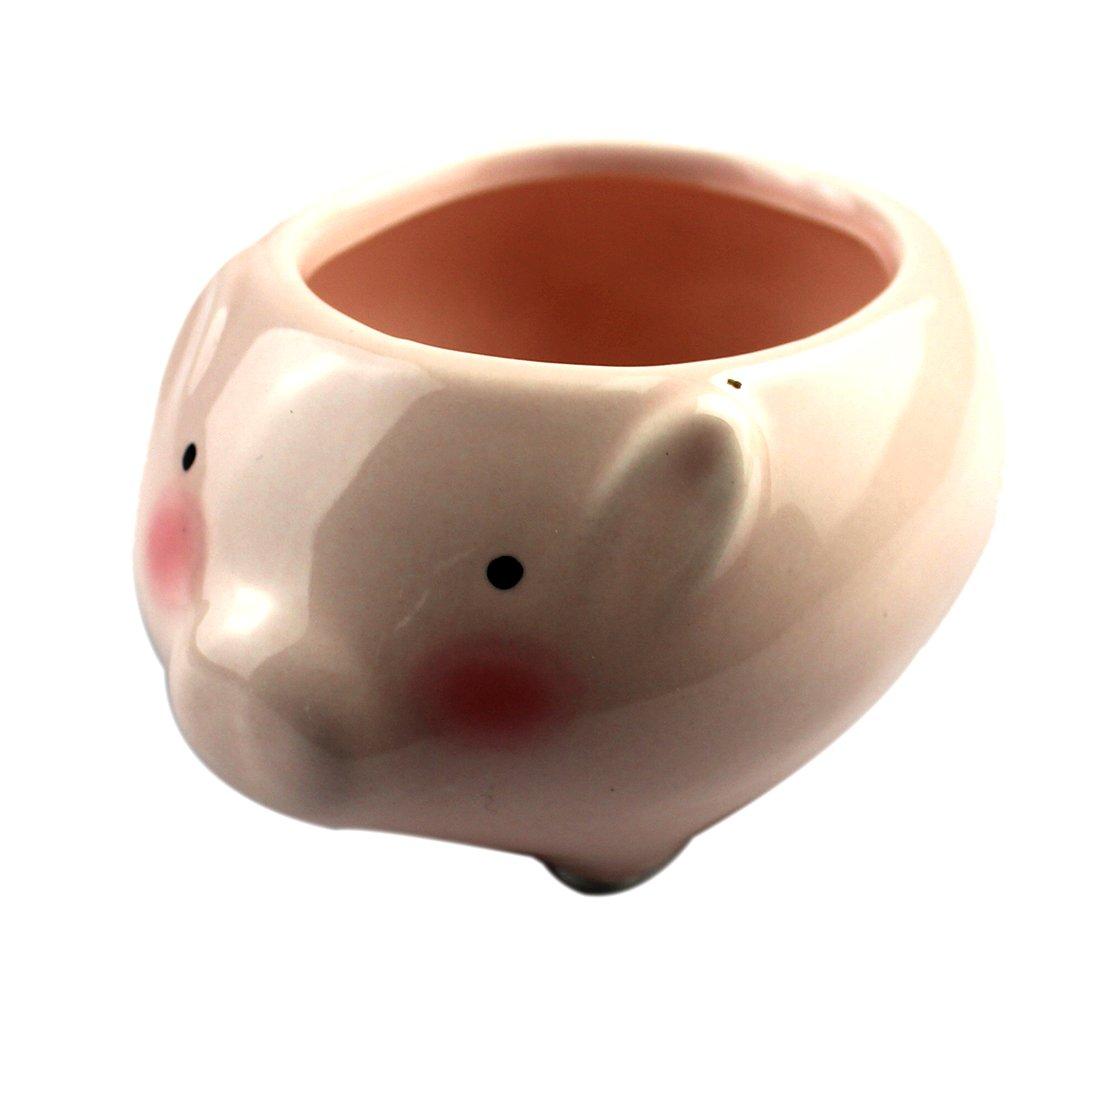 (One Size, Pig) - Animals Ceramic Flowerpot Planter Cute Succulent-Pig B06XRB1YHL 豚 One Size